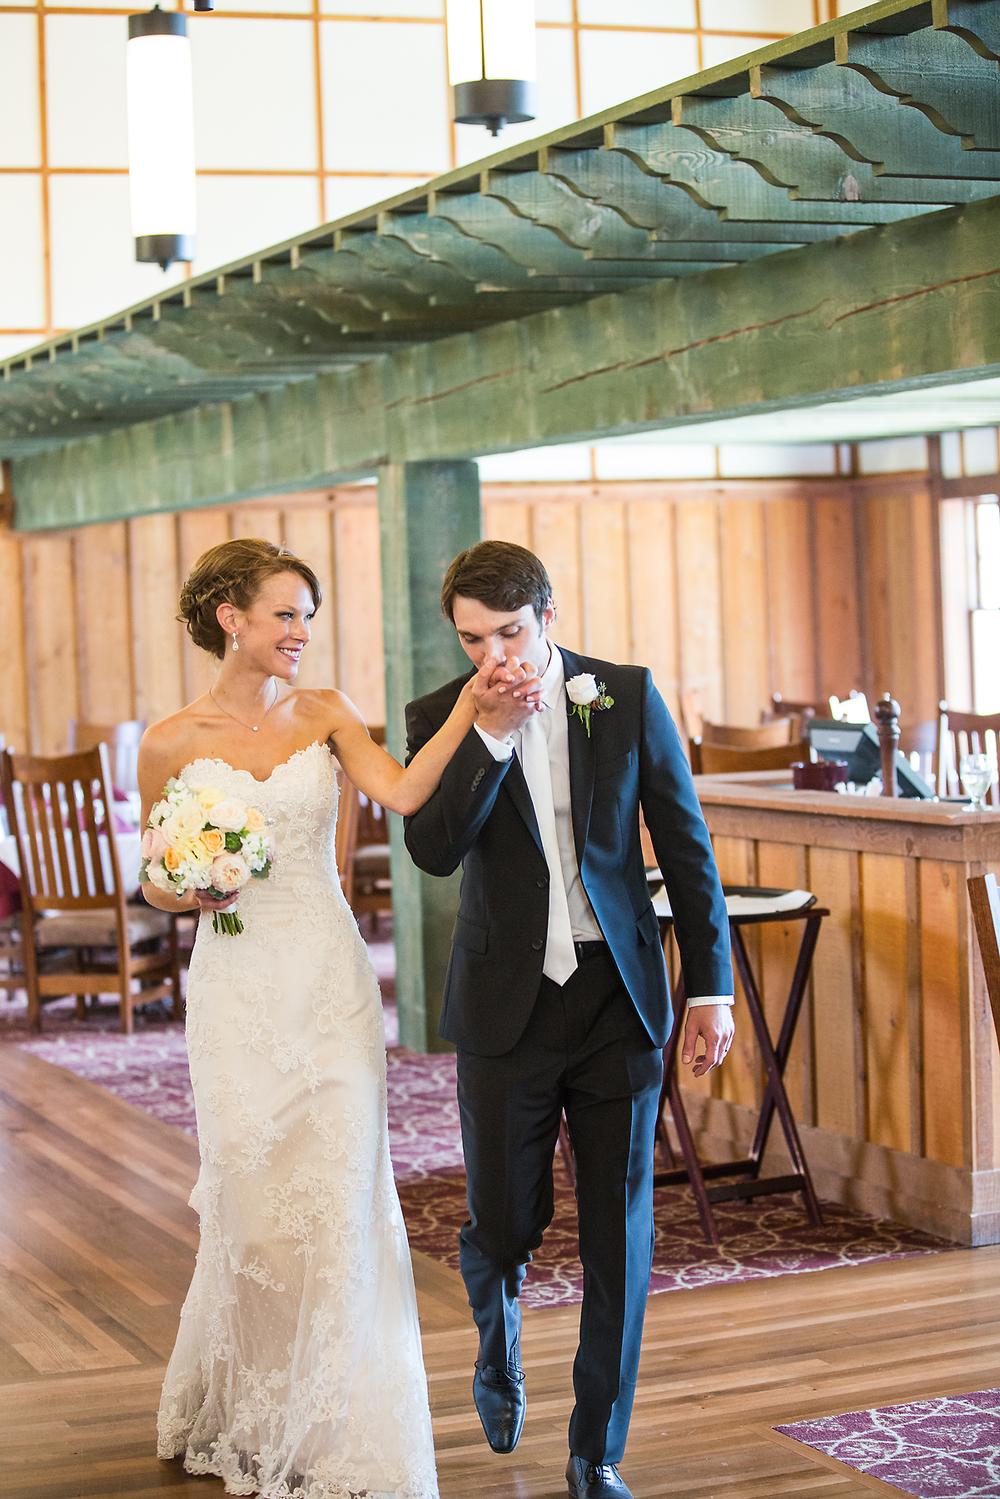 brett-birdsong-photography-082814-married-couple.jpg